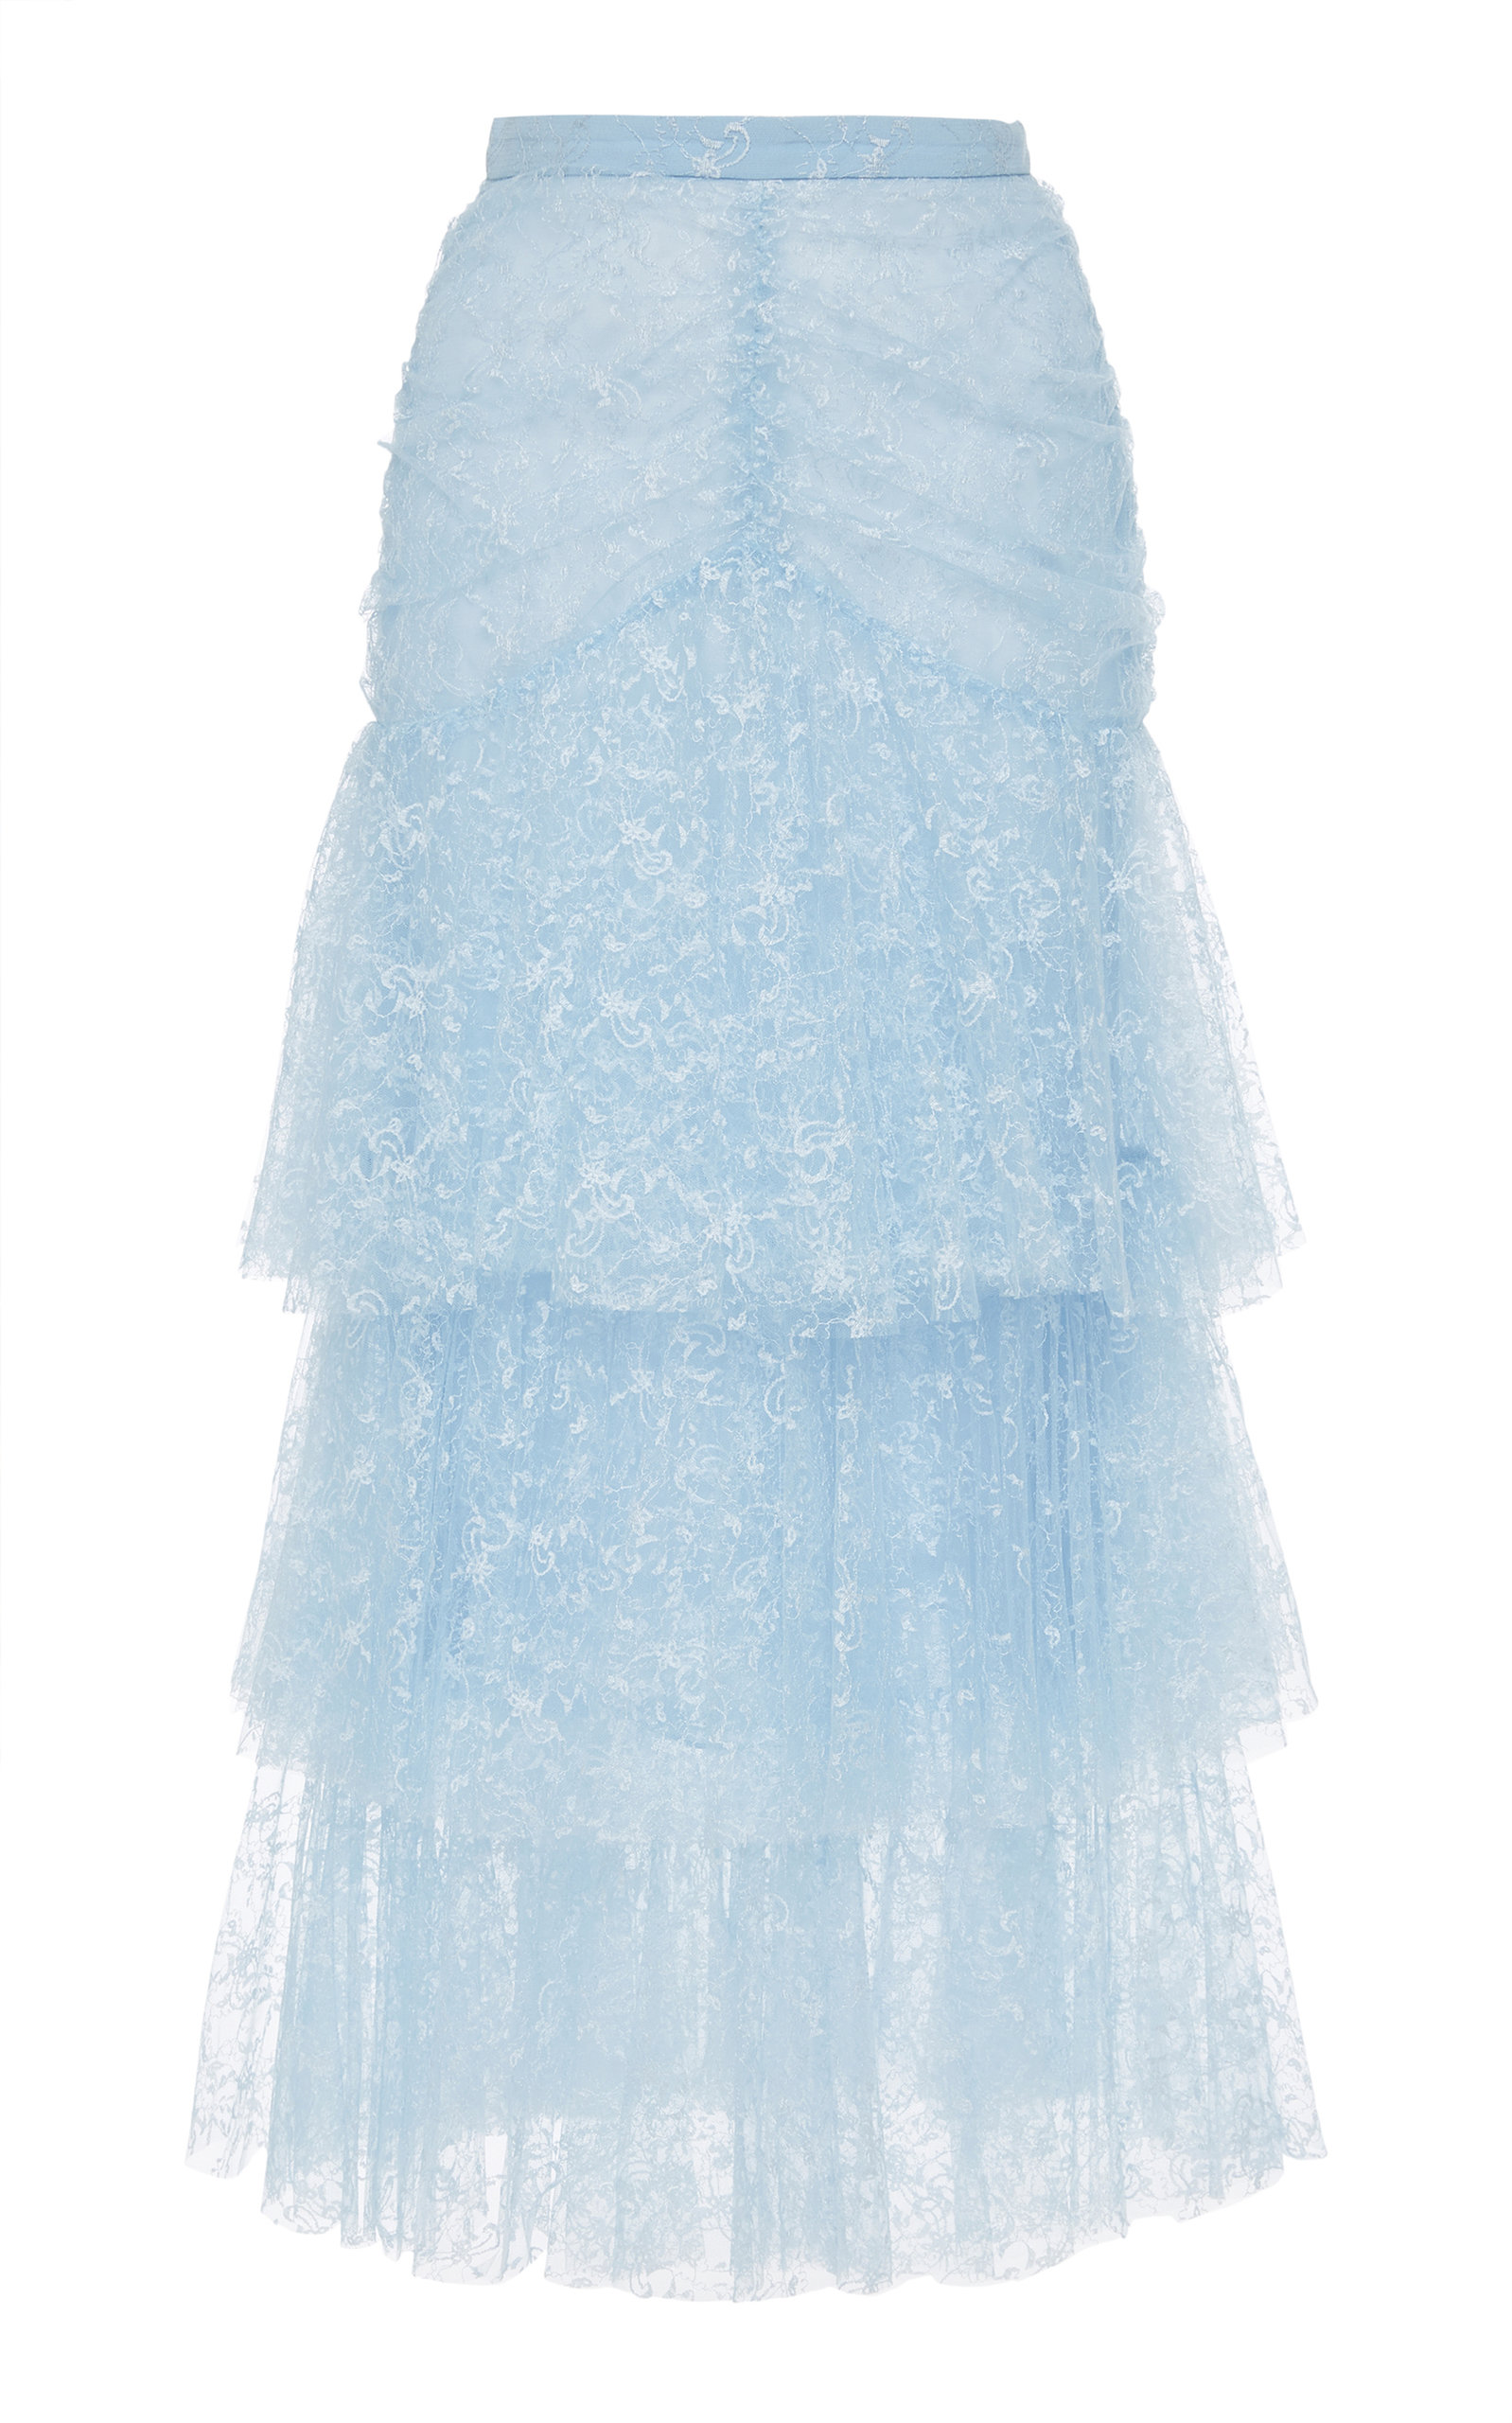 RODARTE Tiered Tulle Maxi Skirt in Light Blue